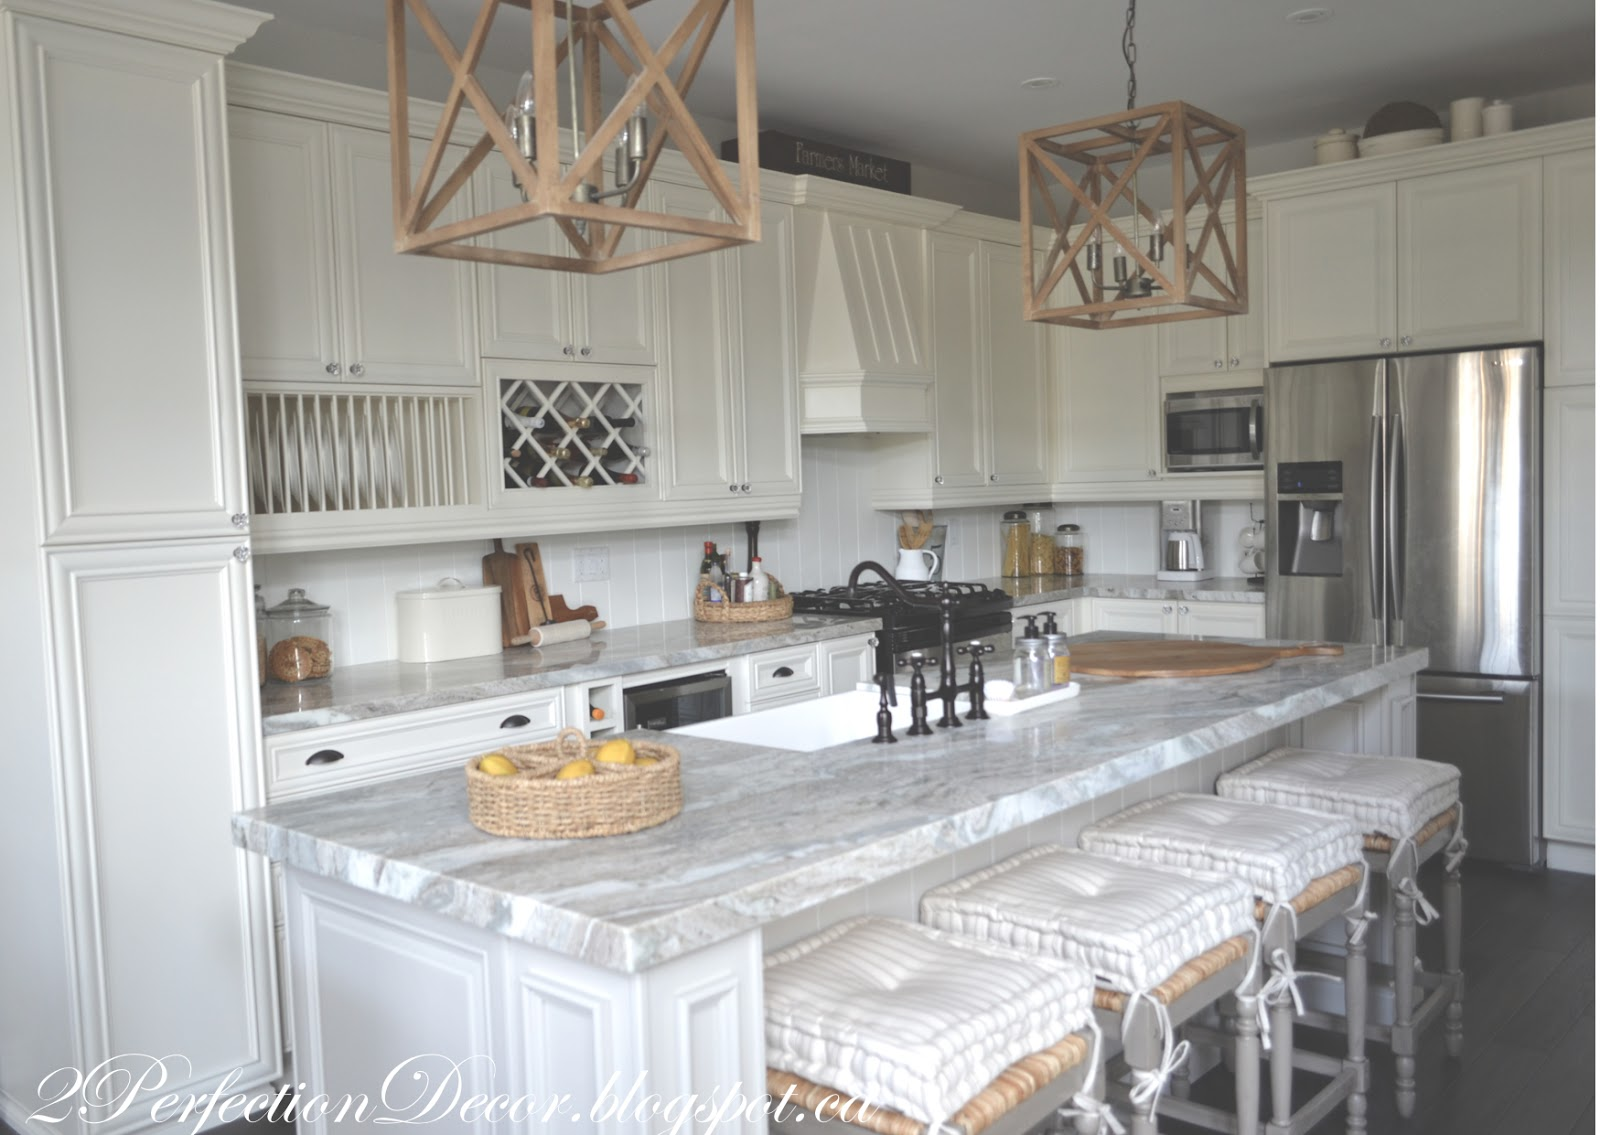 Superb 2Perfection Decor Farmhouse Kitchen Reveal Download Free Architecture Designs Scobabritishbridgeorg